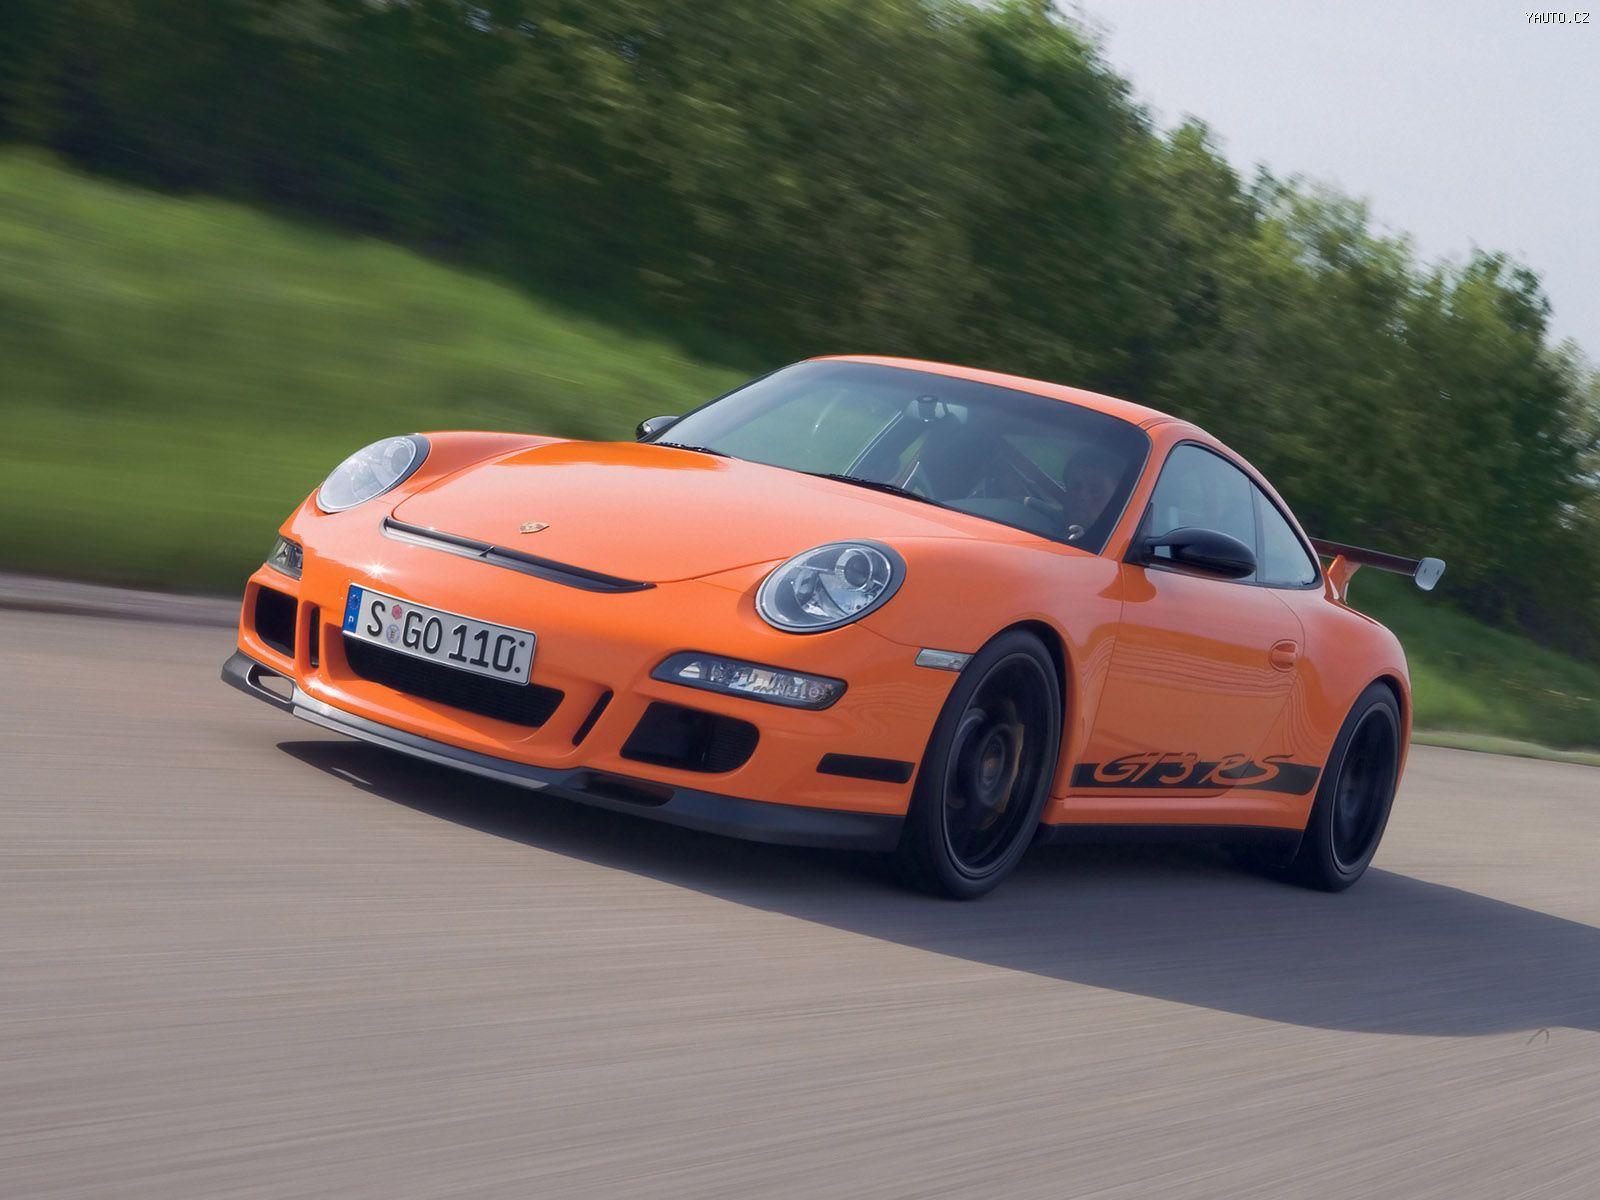 http://img.yauto.cz/tapety/Porsche_911_GT3_RS_2006_1.jpg